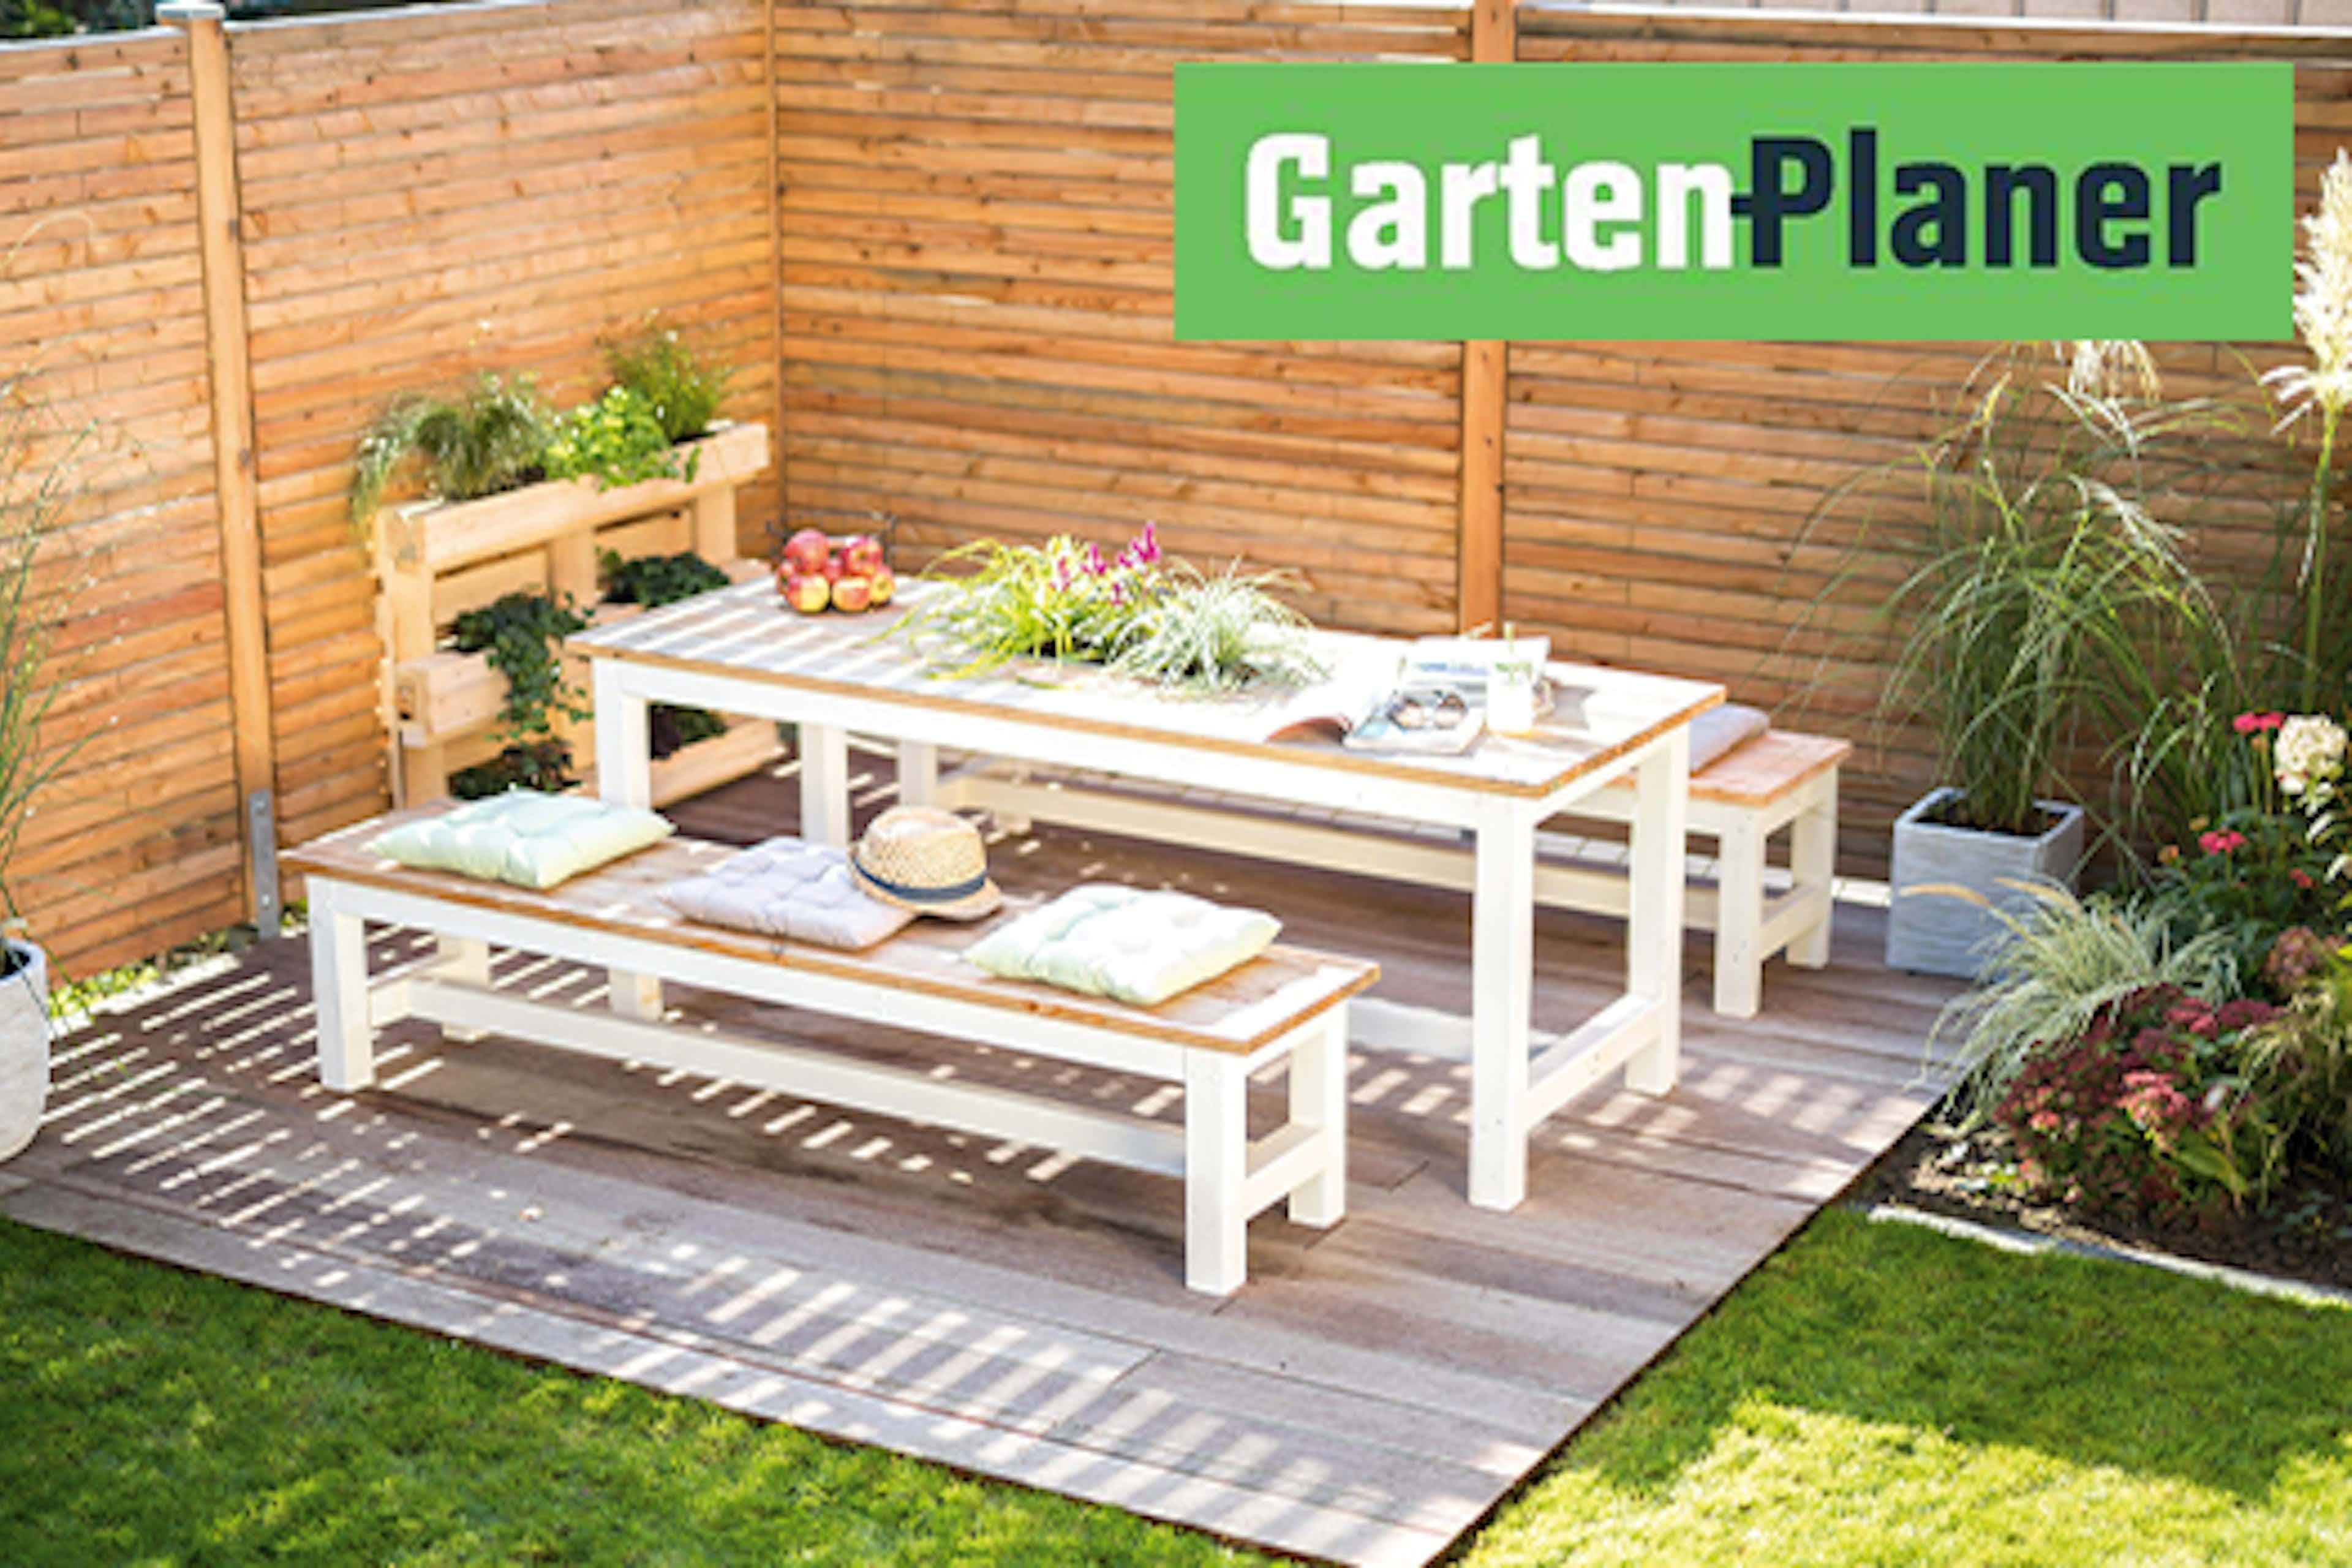 Gartenbedarf Kaufen Garten Shop Bei Obi